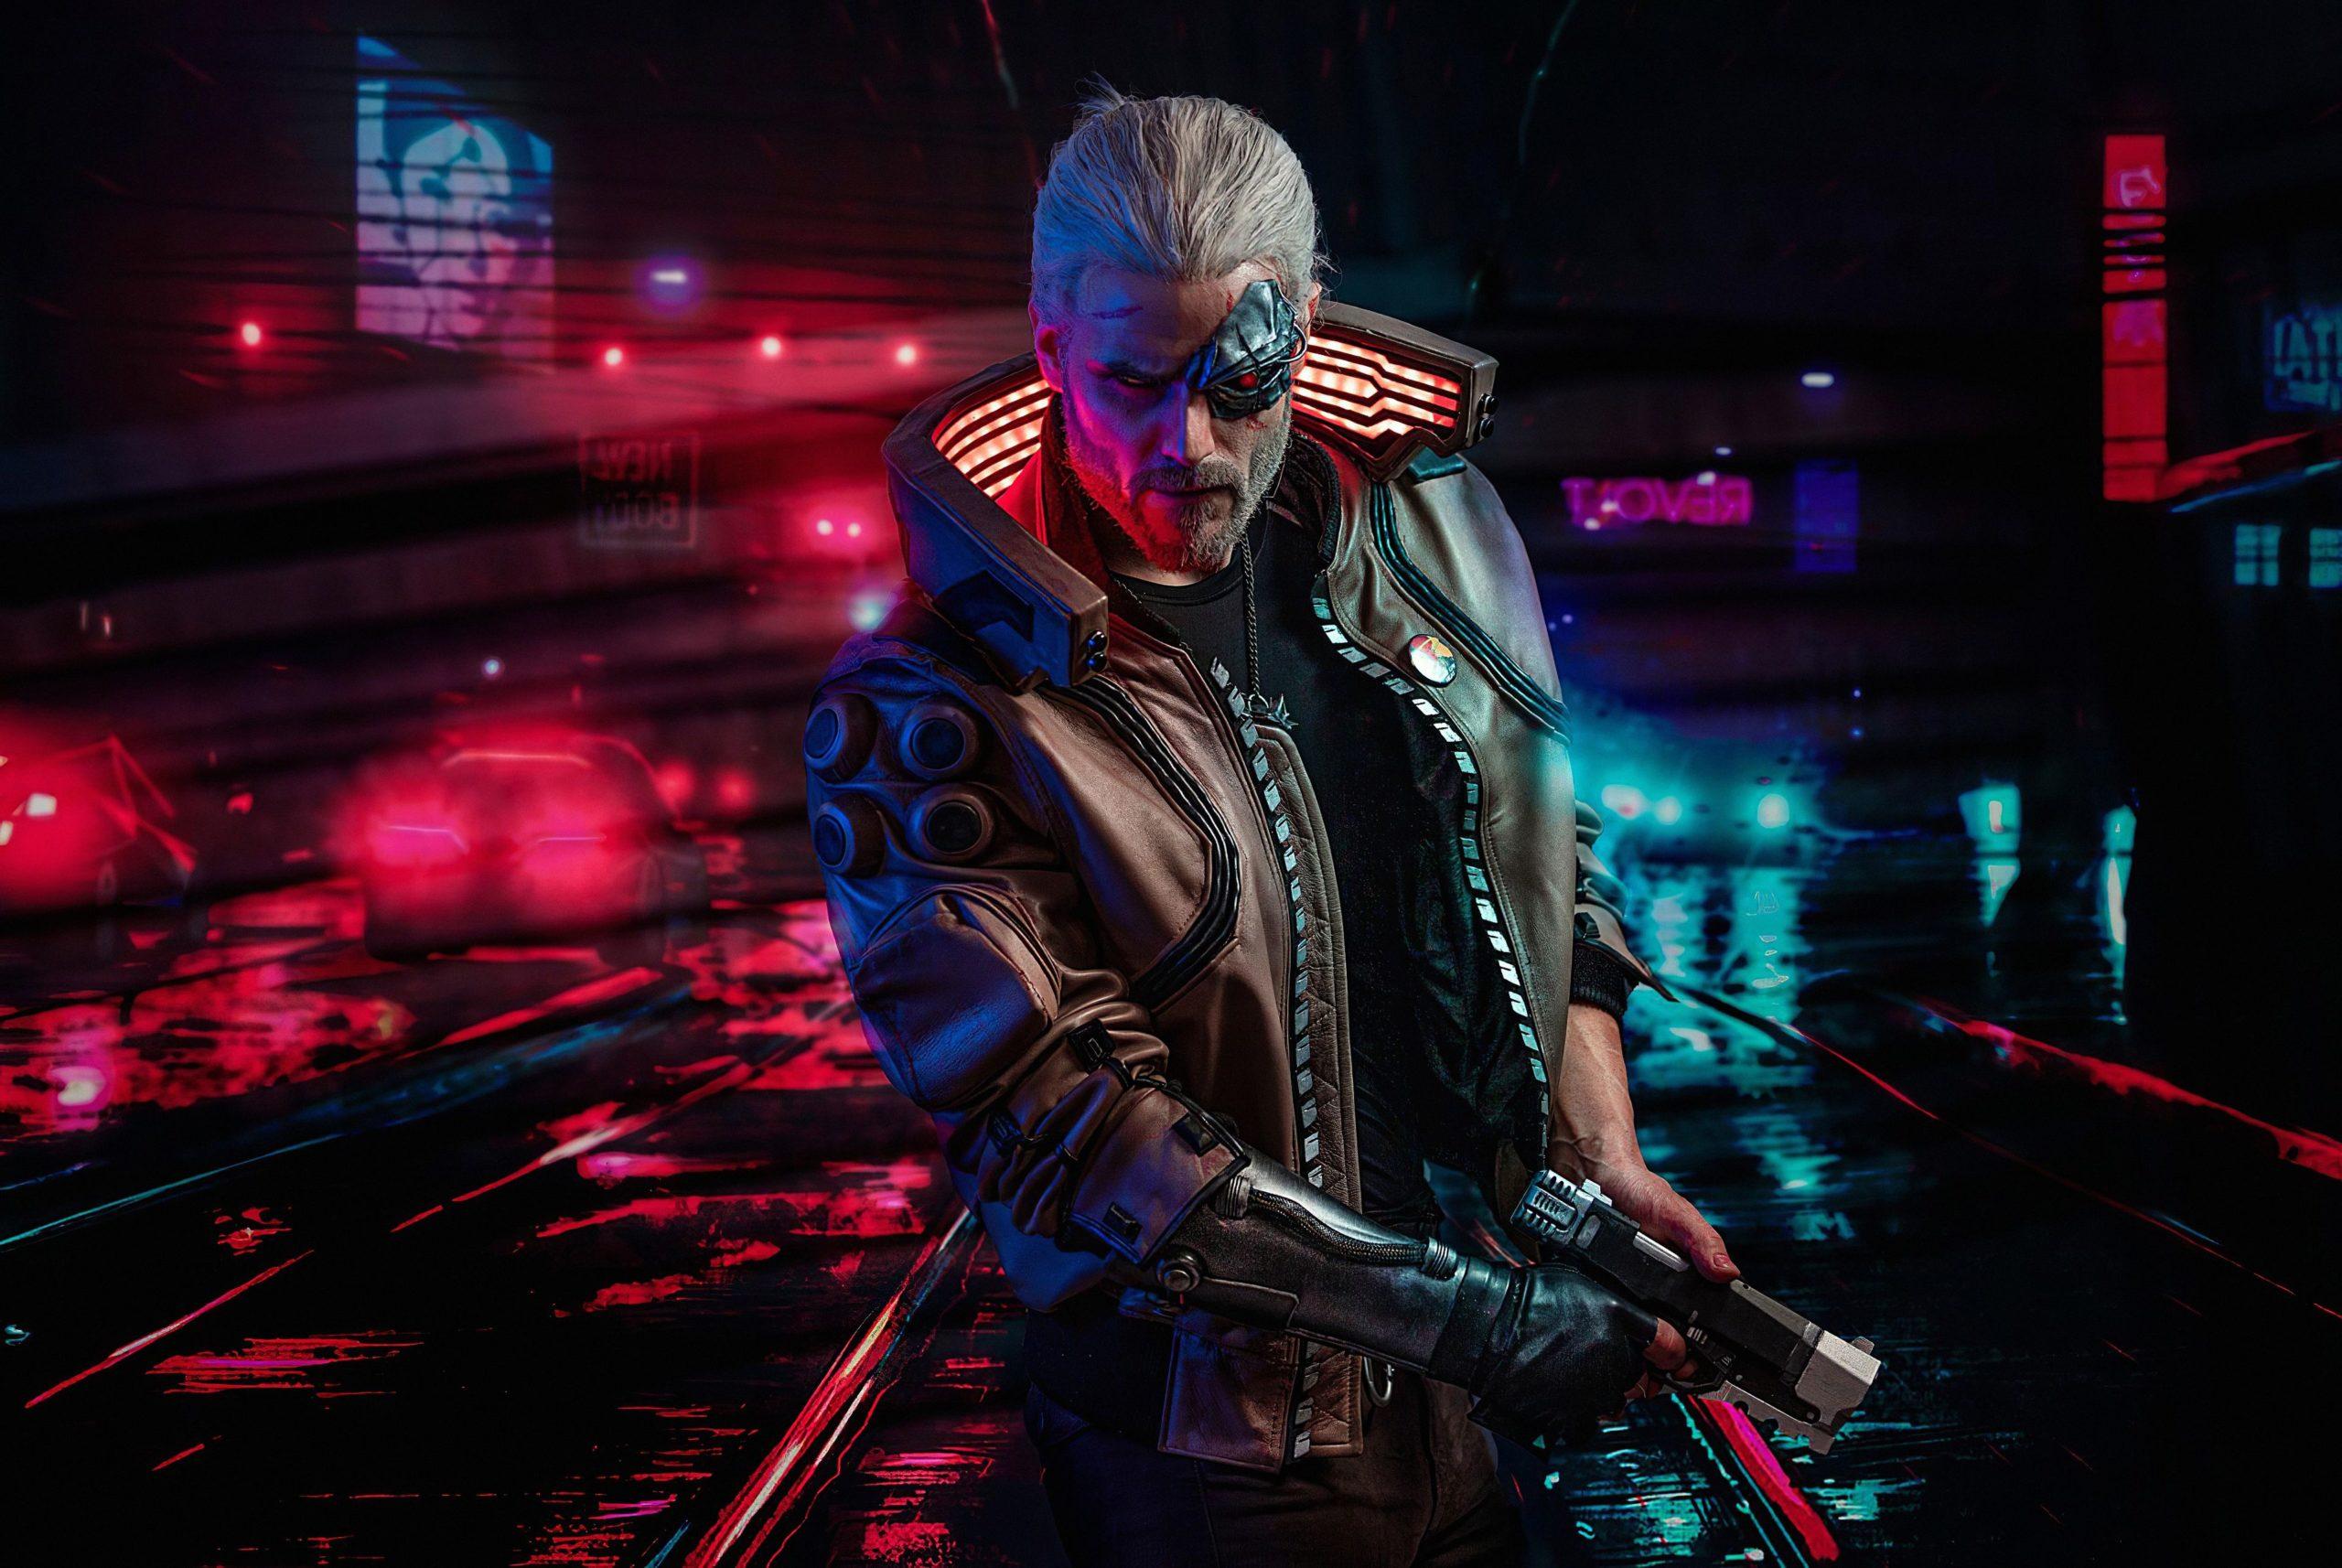 cyberpunk photos hd